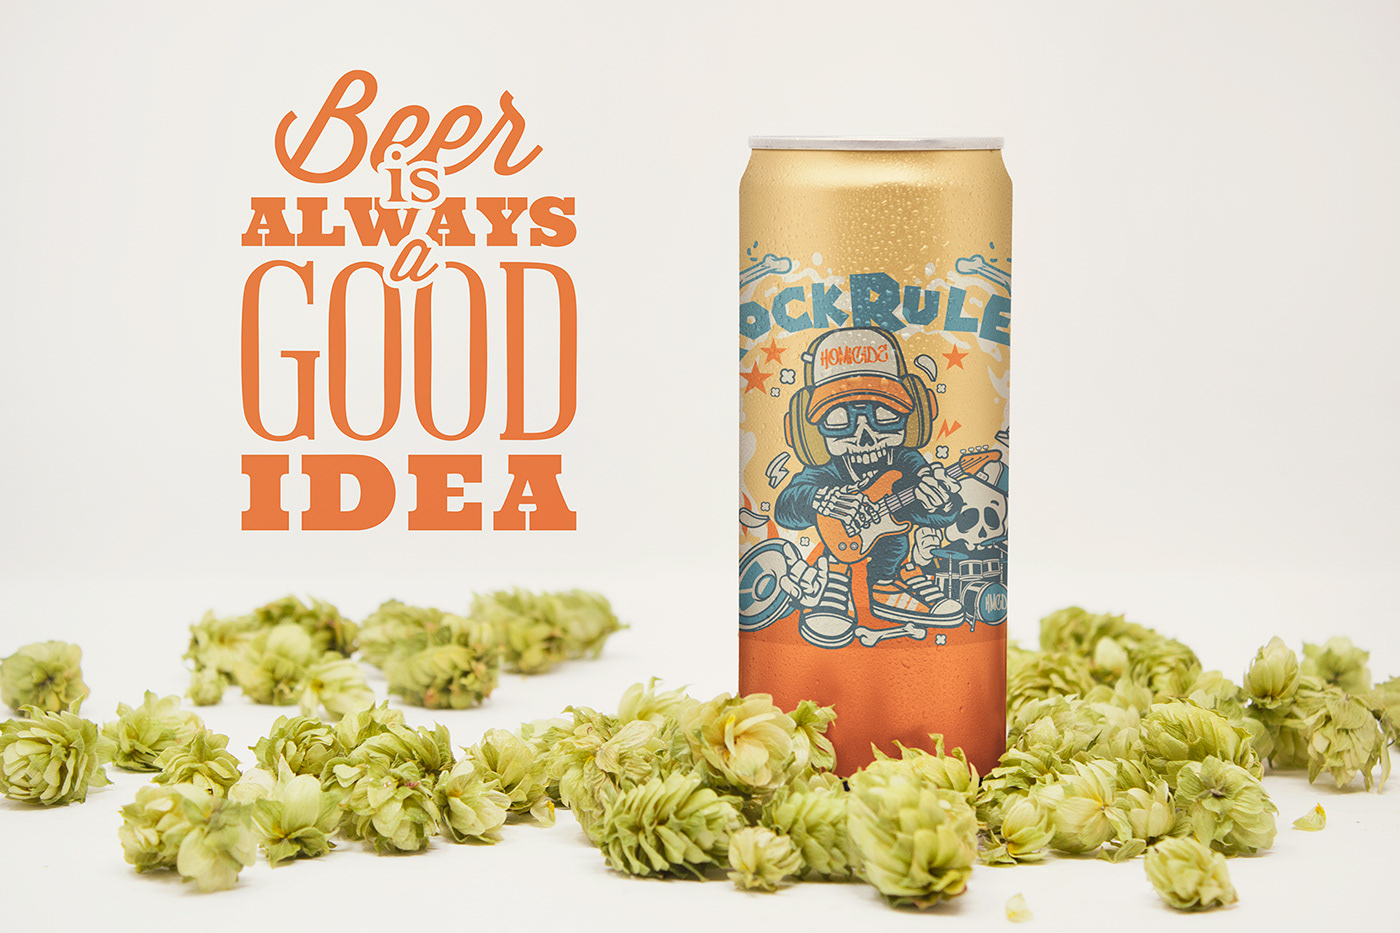 12oz beer can free freebie front hop mock-up Mockup photo